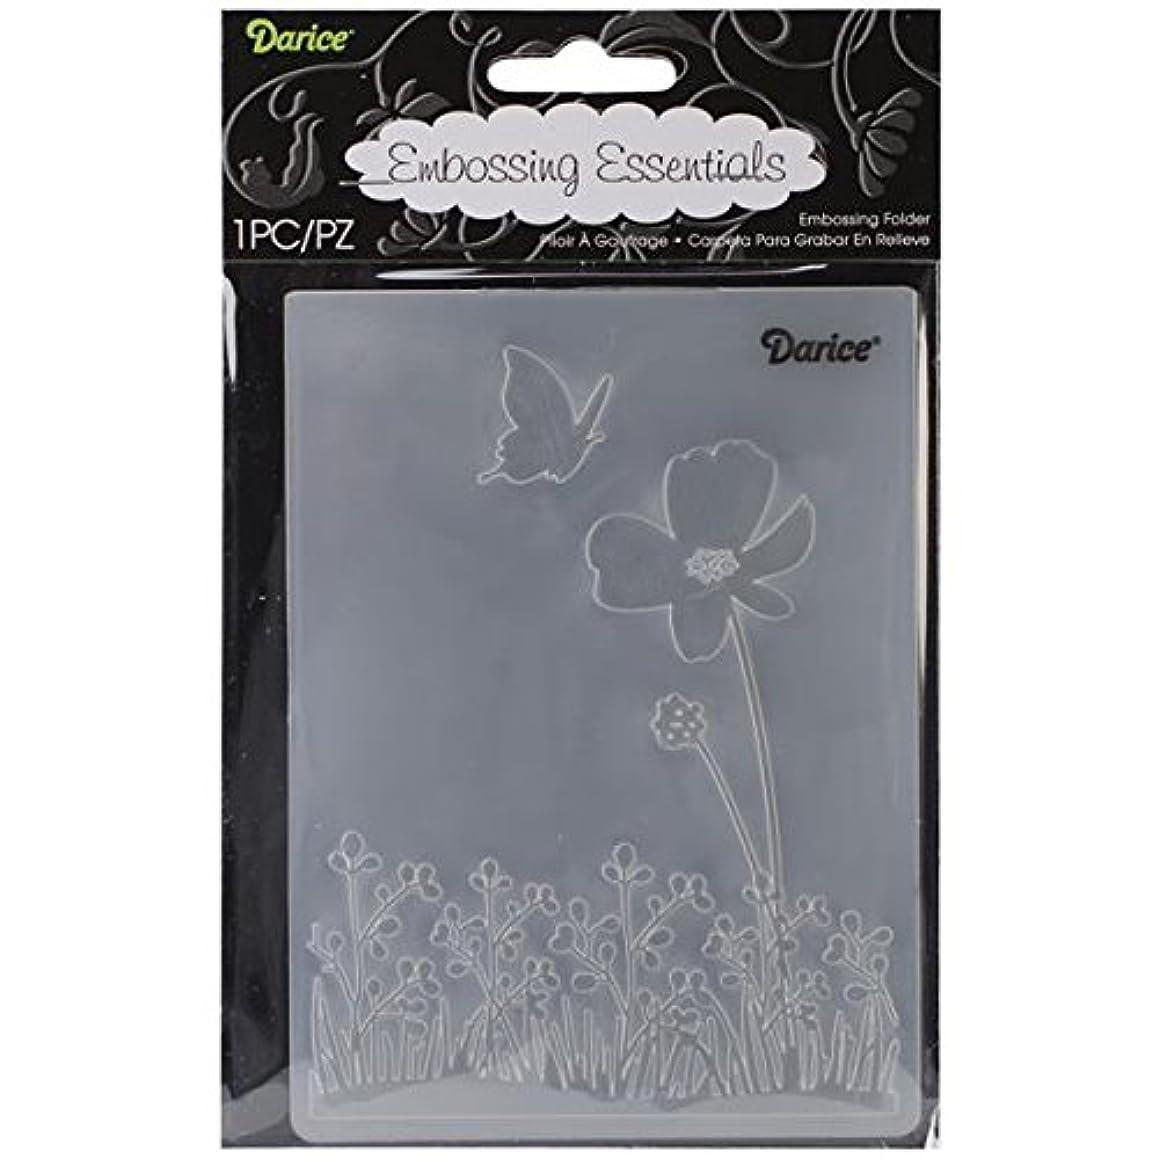 Darice EB12-18-54 Embossing Folder, 4.25 by 5.75-Inch, Butterfly on Flower